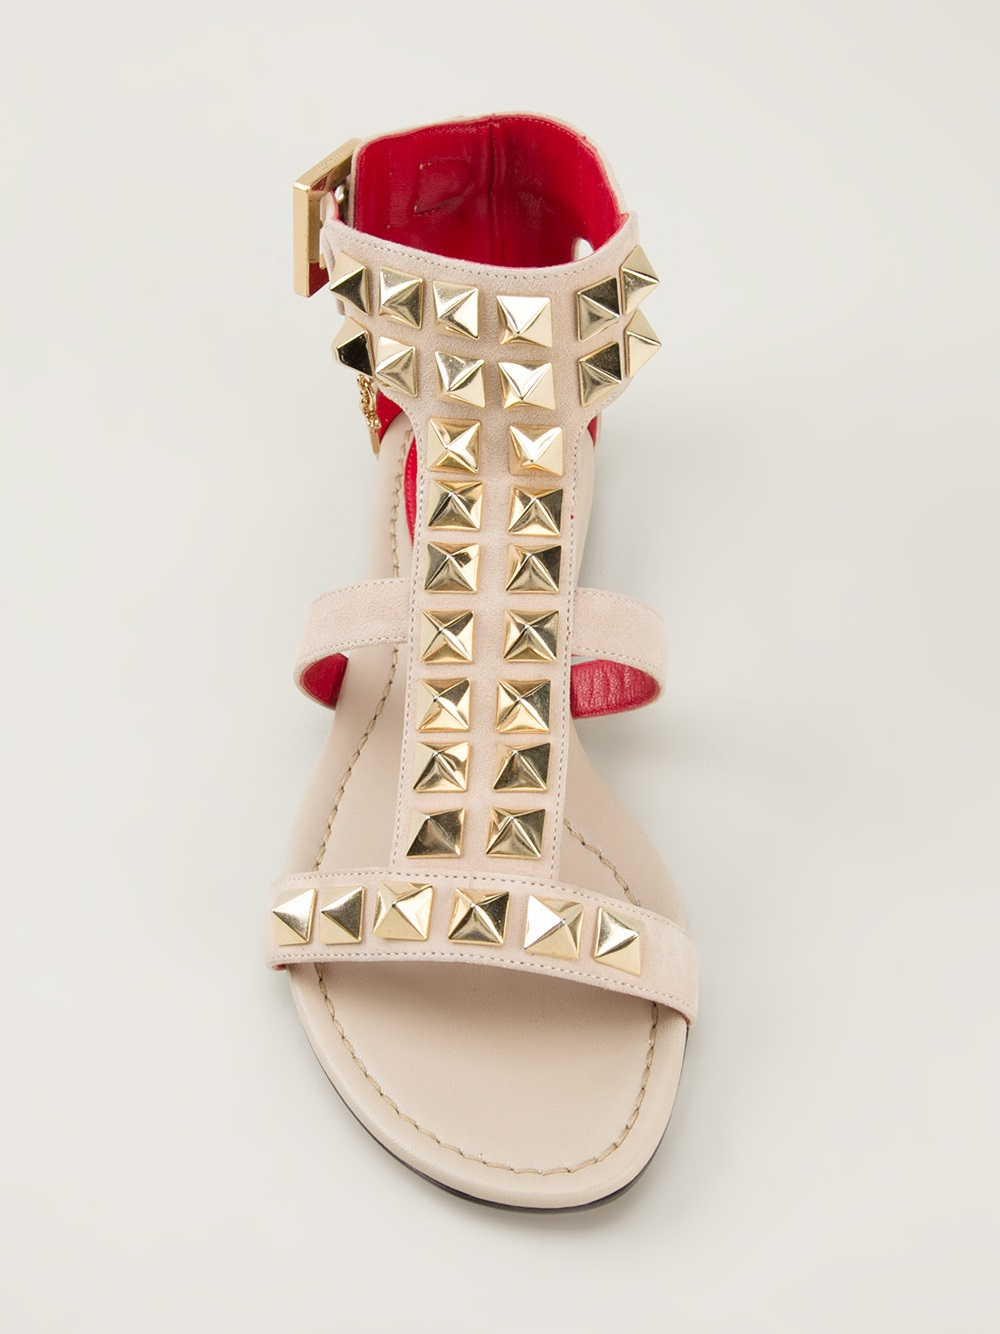 Studded Paciotti Sandals In Cesare Lyst Flat Nnwovm08 Natural kOiPuTXZ